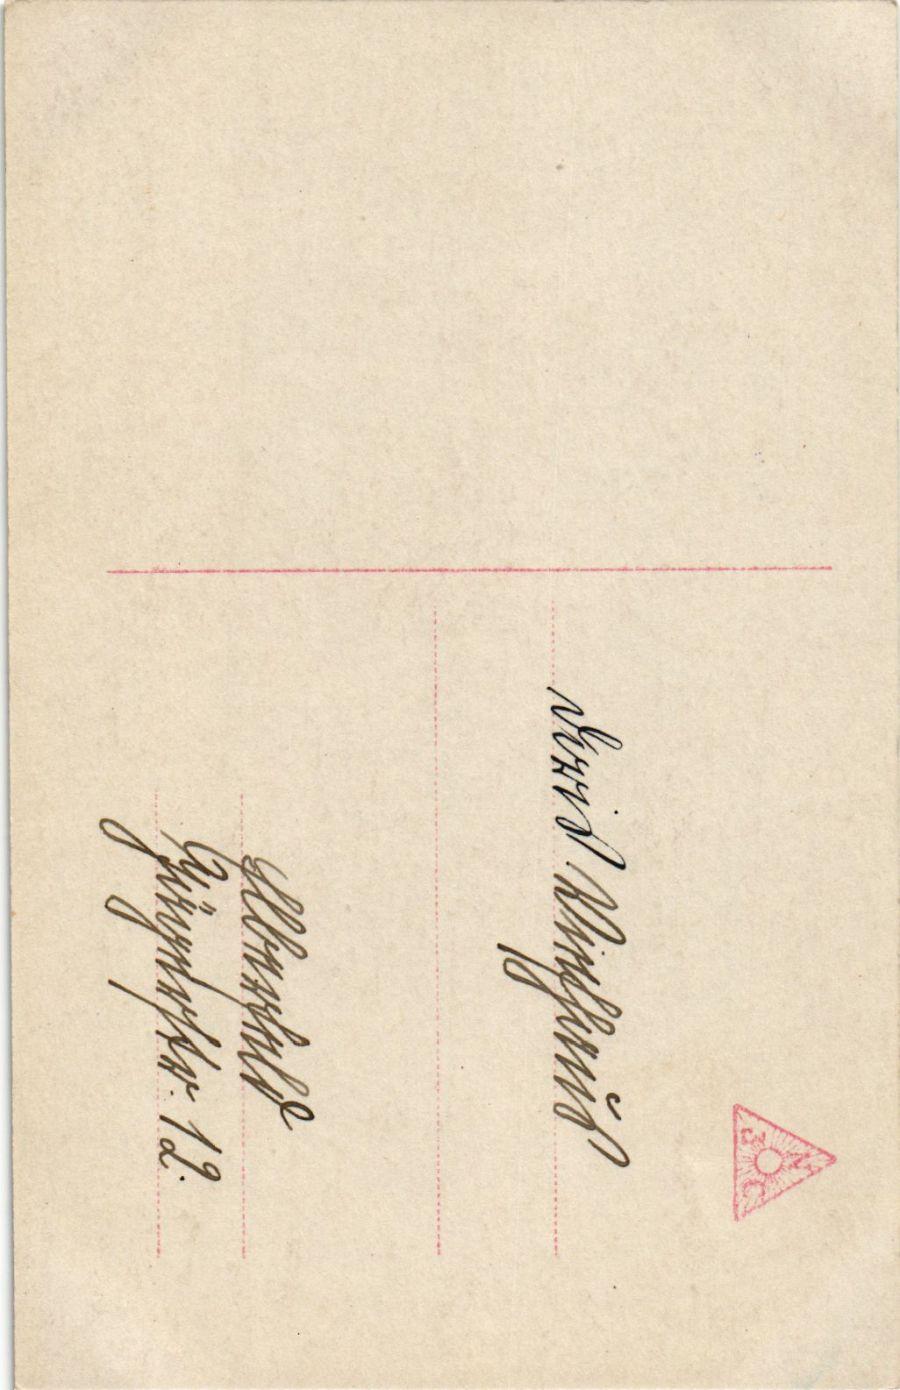 CPA-AK-Prinzessin-Joachim-v-Preussen-GERMAN-ROYALTY-867648 Indexbild 2